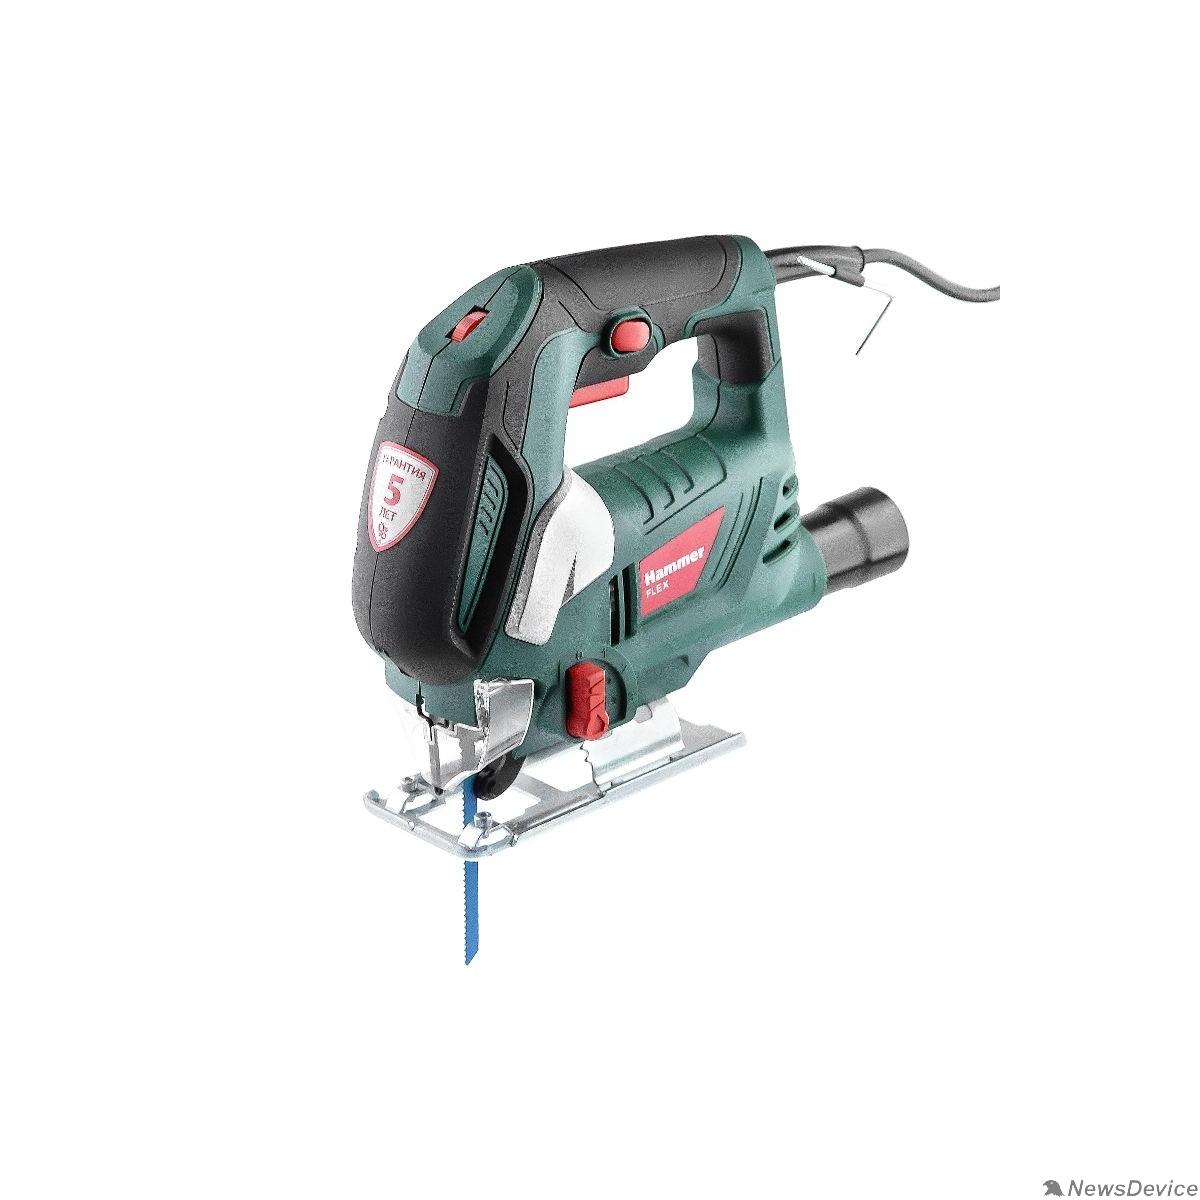 Лобзик Hammer Flex LZK790L Лобзик  630443 790Вт 0-3000ход/мин 90мм-дер 8мм-мет маятник